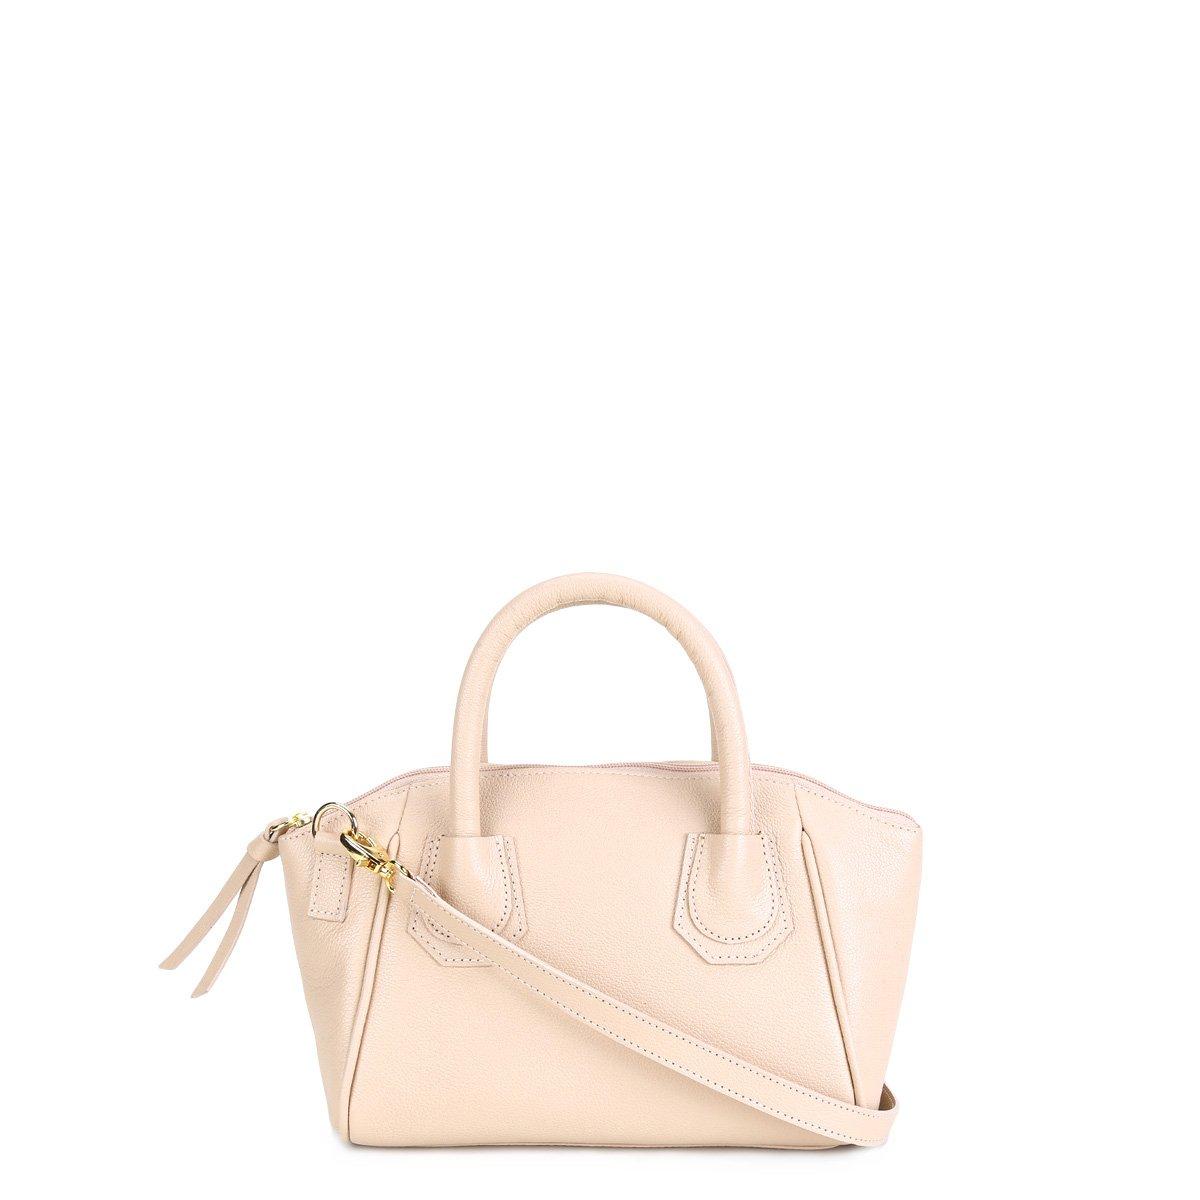 3652c8b62 Bolsa Couro Shoestock Mini Bag Clássica Tiracolo Feminina | Livelo ...